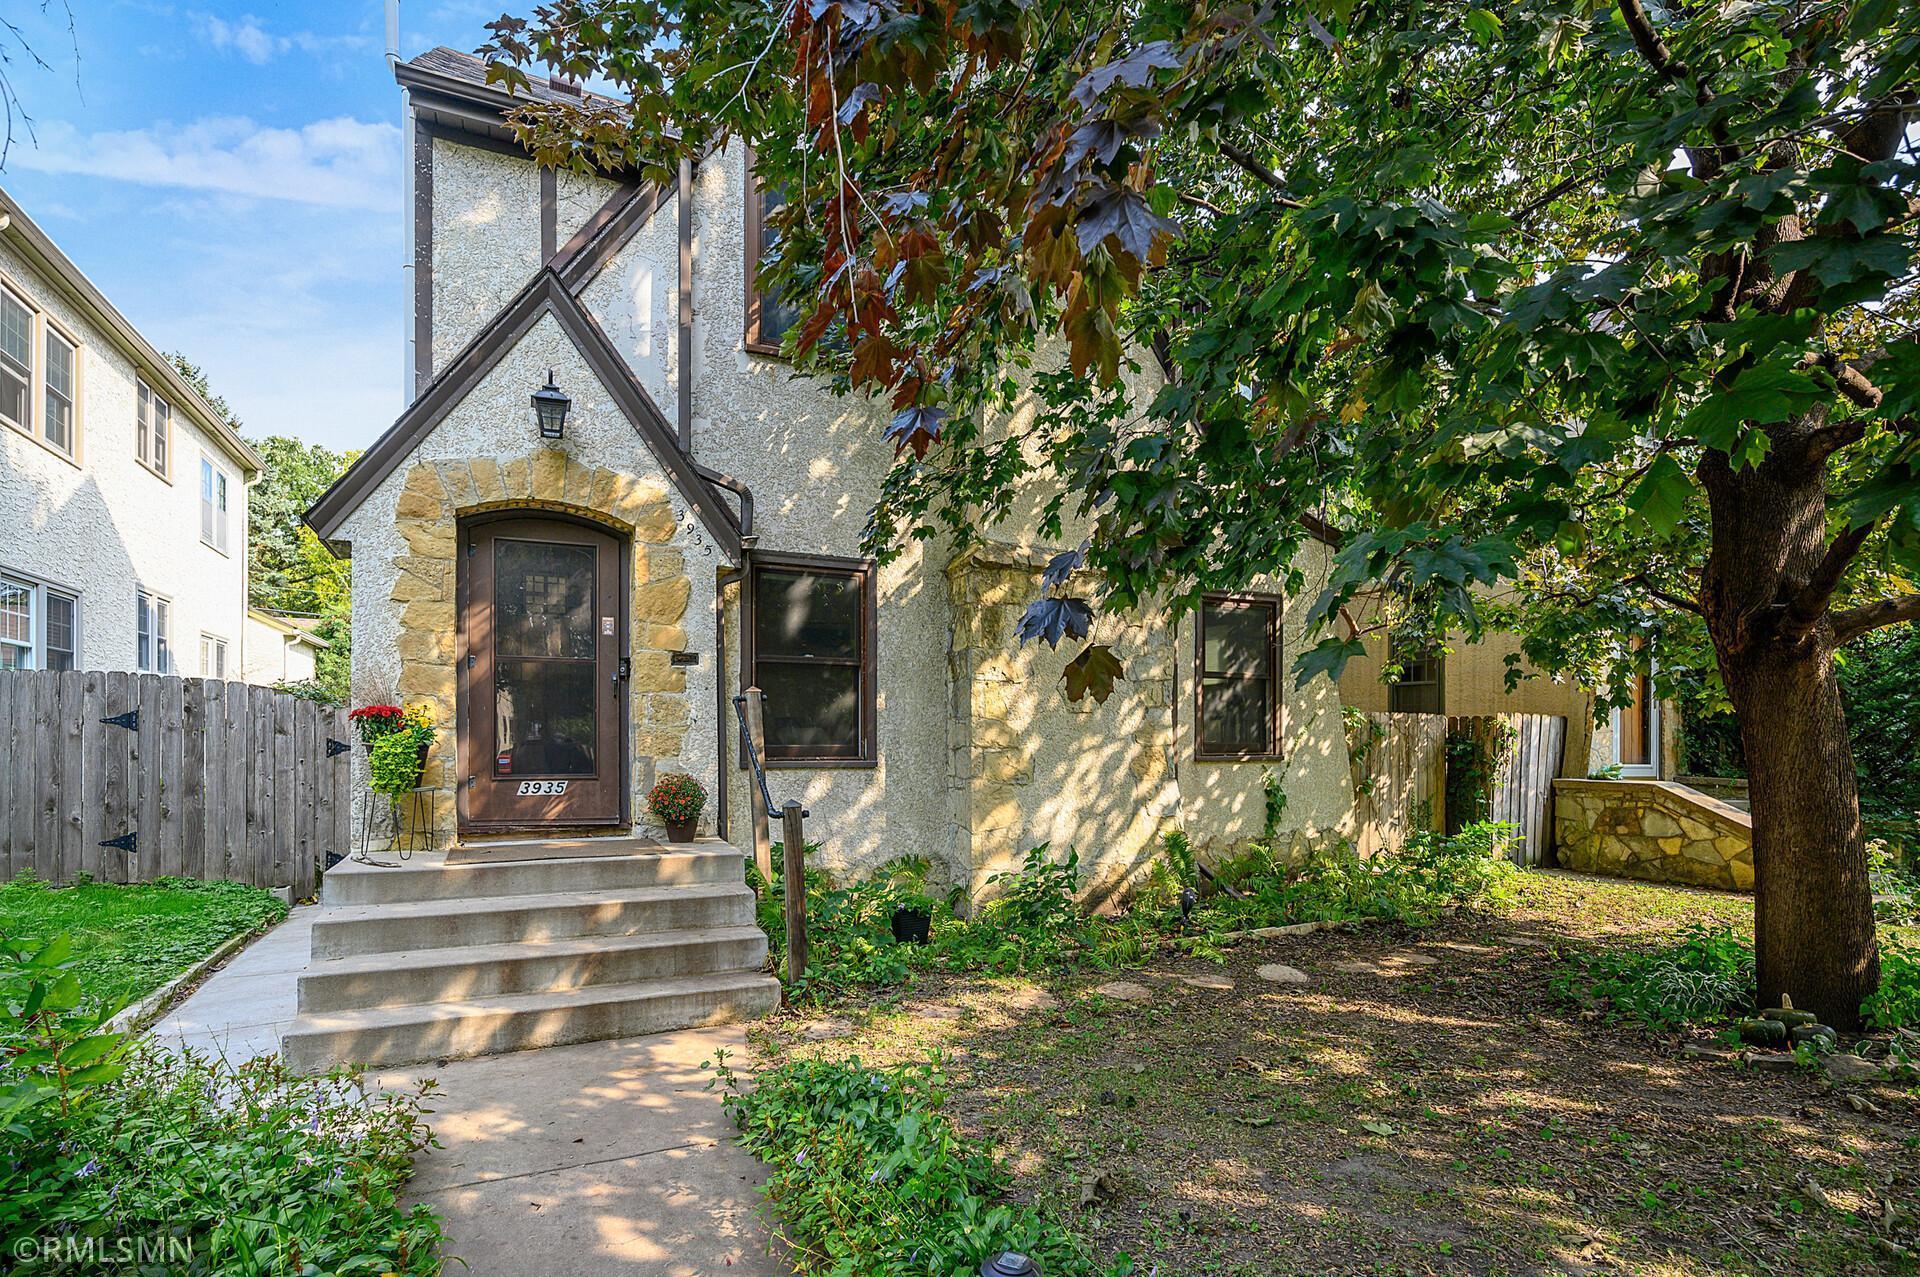 3935 1st Avenue S Property Photo - Minneapolis, MN real estate listing